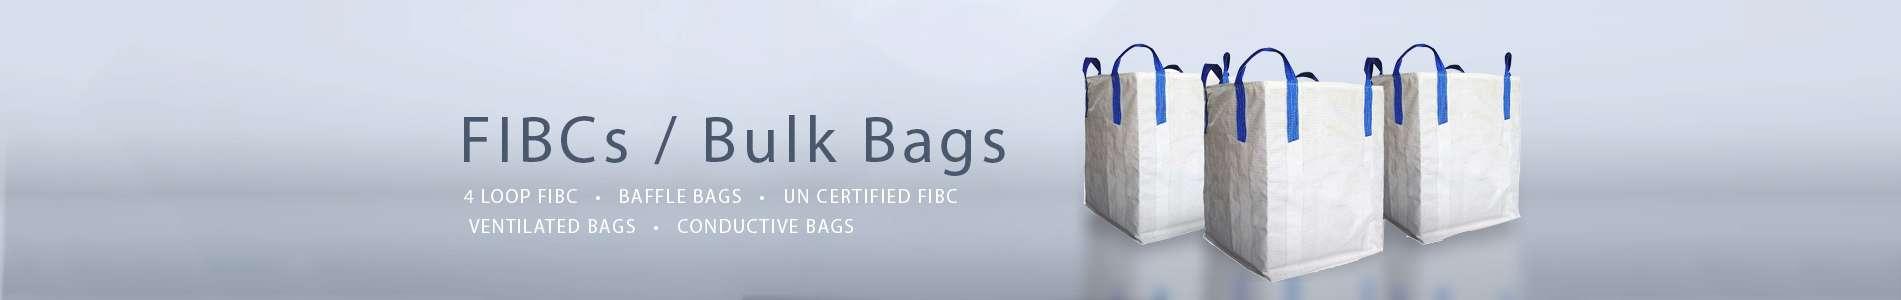 UN Certified FIBC